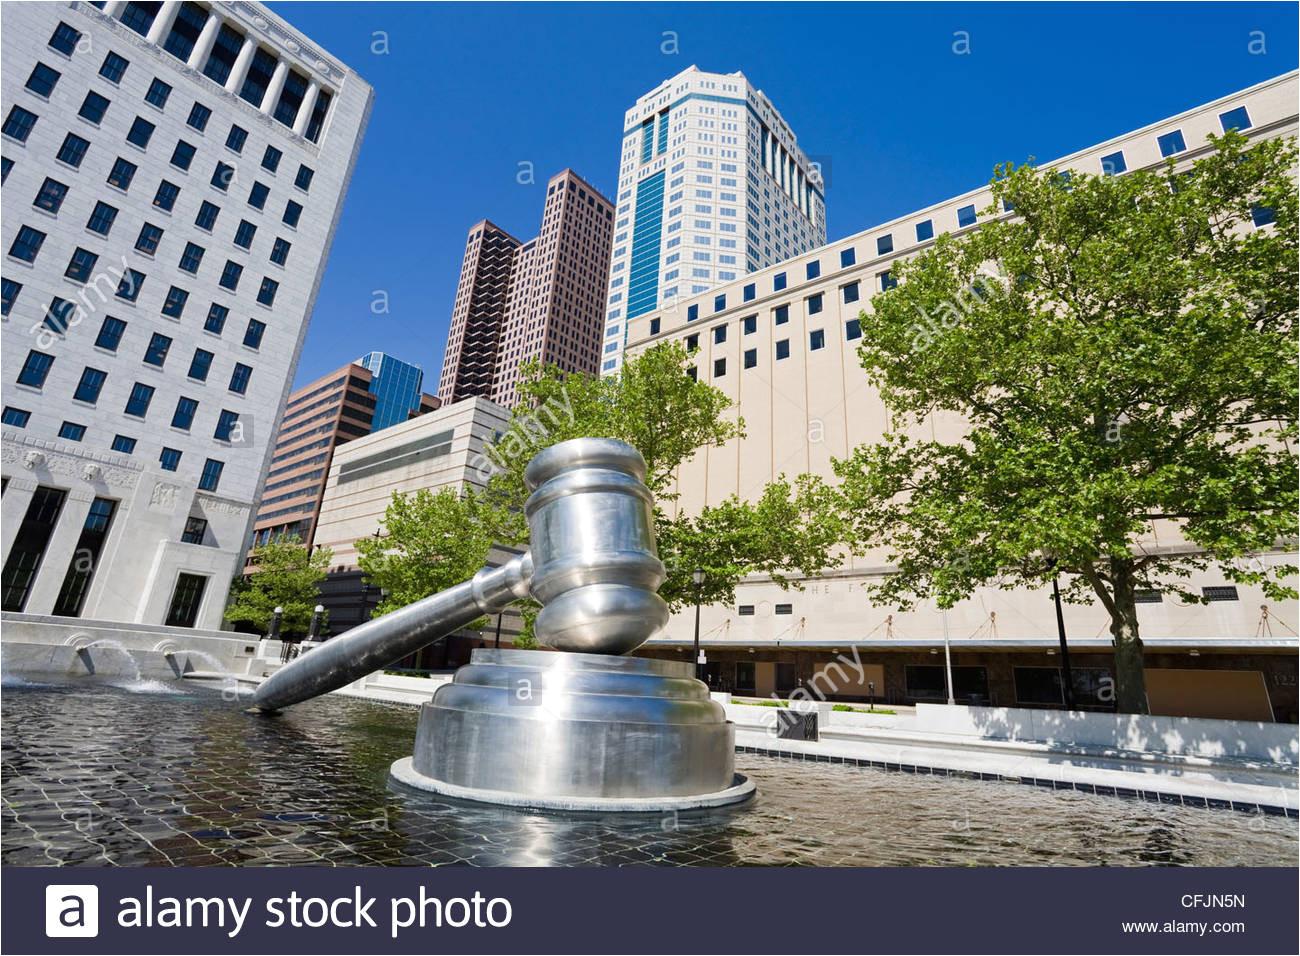 hammer skulptur aua erhalb der ohio judicial center columbus ohio vereinigte staaten von